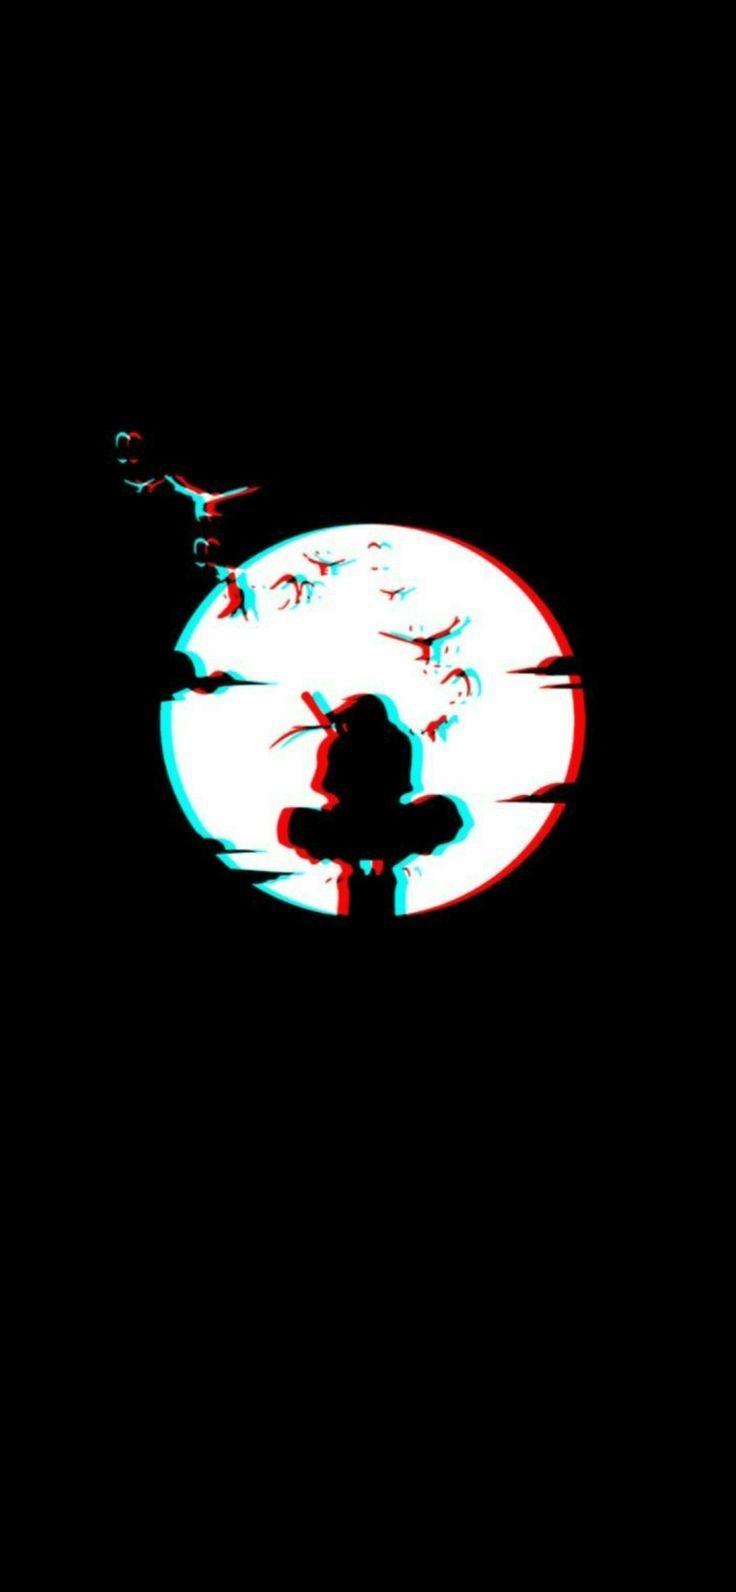 Pin By Love On instagram highlights logo In 2020 Wallpaper Naruto Shippuden Cute Anime Wallpaper Naruto Art